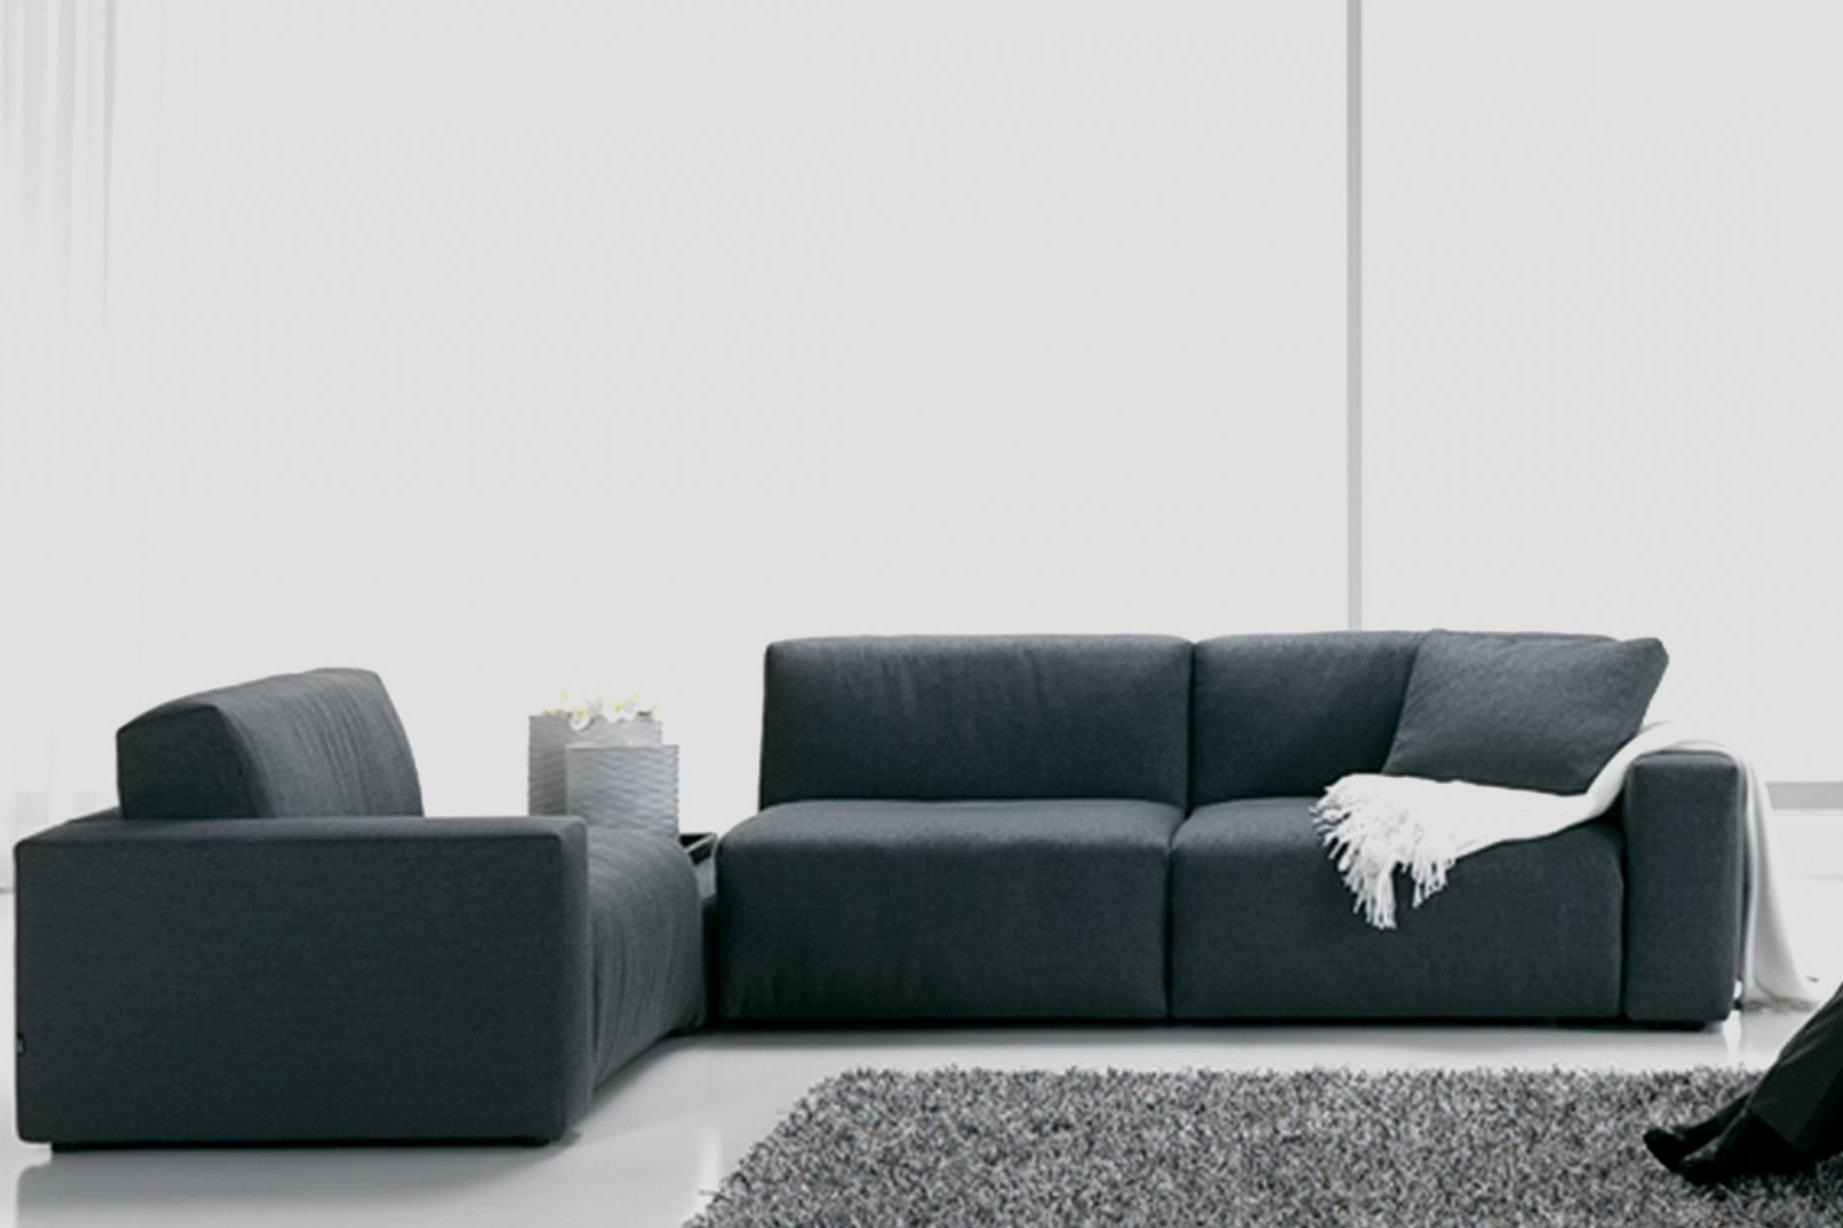 Sofas Modulares Conforama S5d8 sofas Modulares Conforama Bello Ikea Canape Lit Bz Conforama Alinea